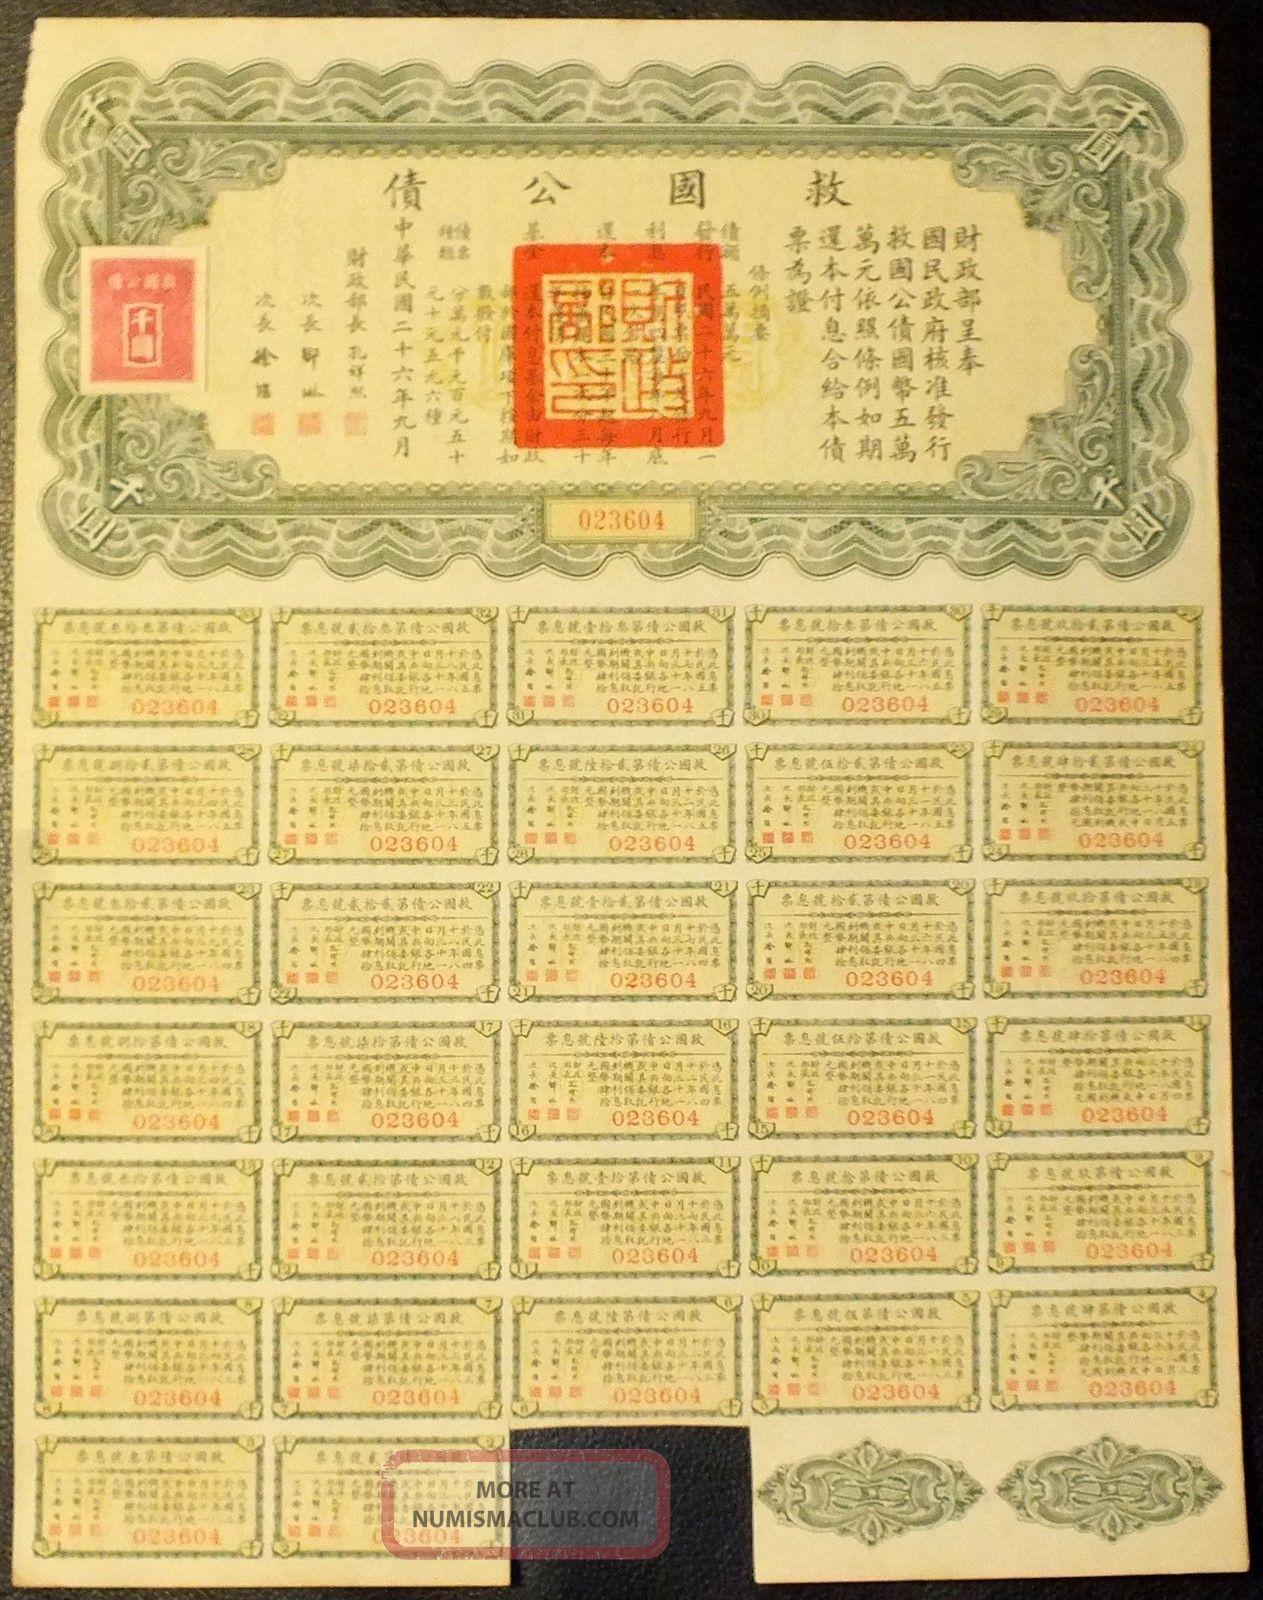 Rare China 1937 Liberty Bond $1000 Uncancelled Coupons Embossed Chinese Sun Seal Stocks & Bonds, Scripophily photo